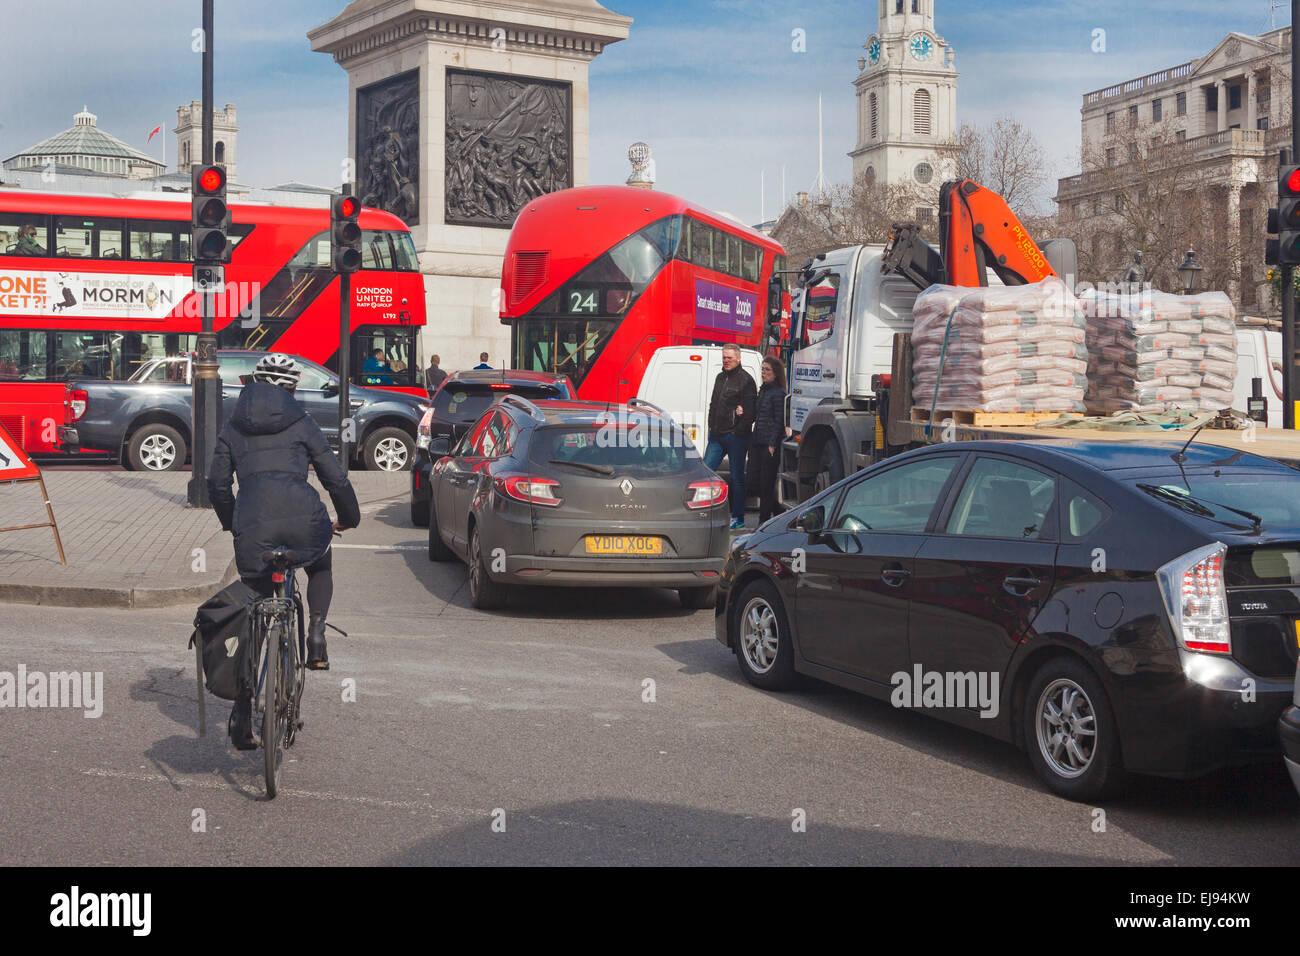 London, Trafalgar Square   Late morning traffic congestion approaching gridlock - Stock Image